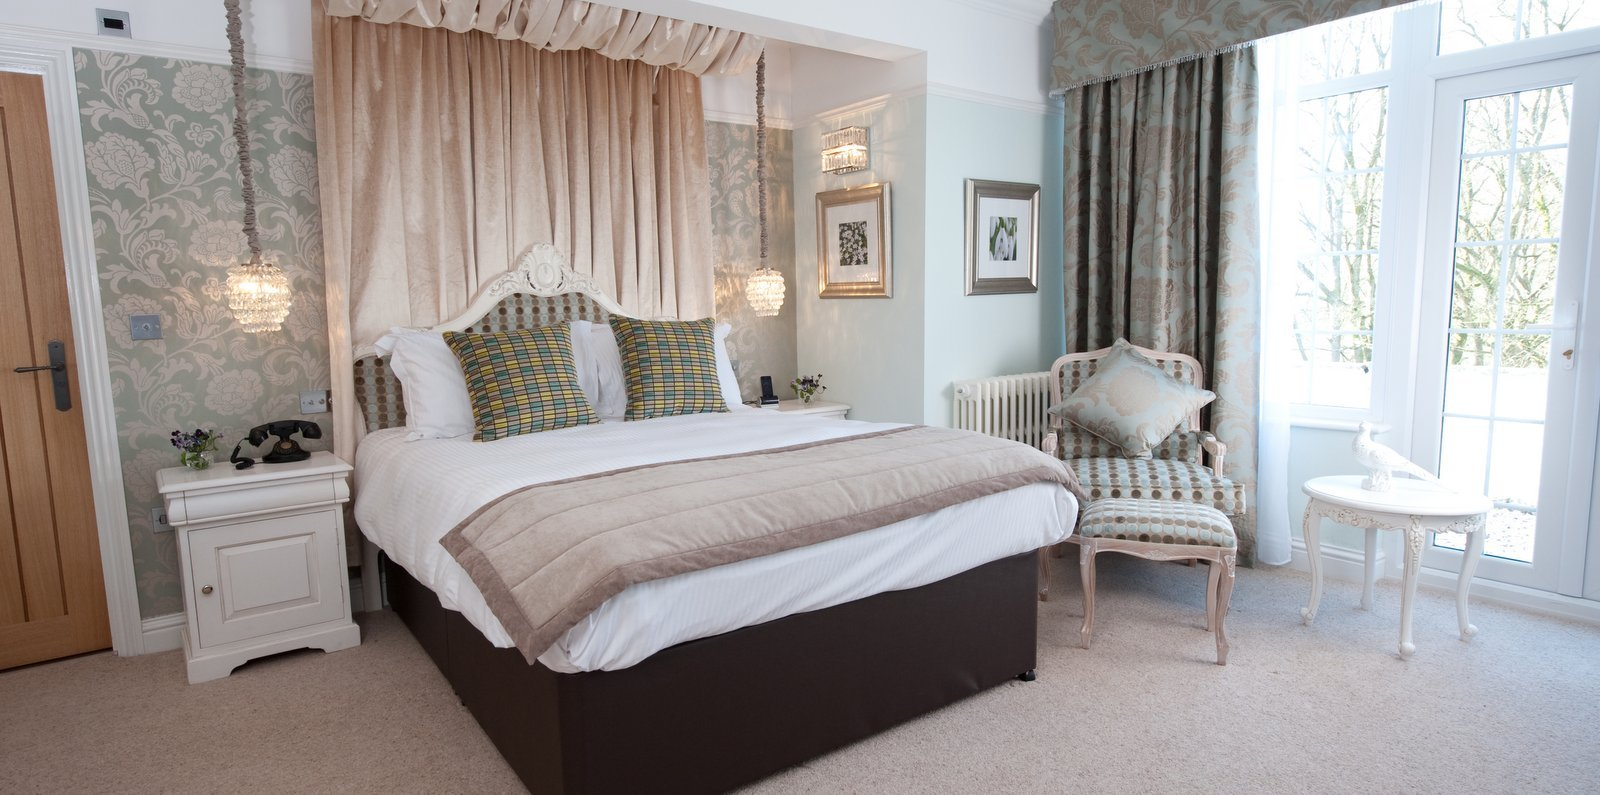 09-A-Luxury-Bedroom